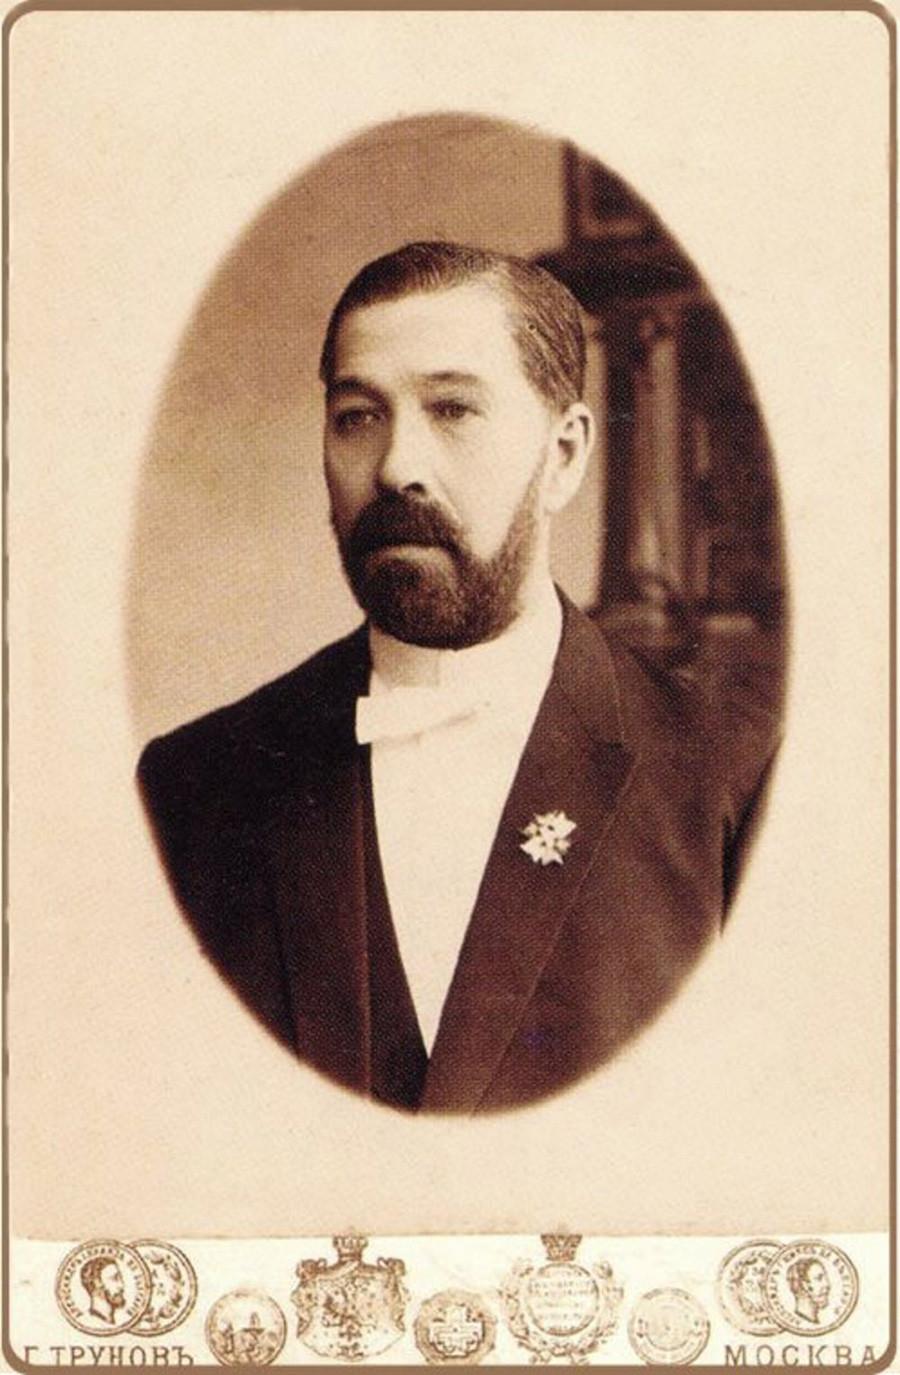 Pyotr Smirnov